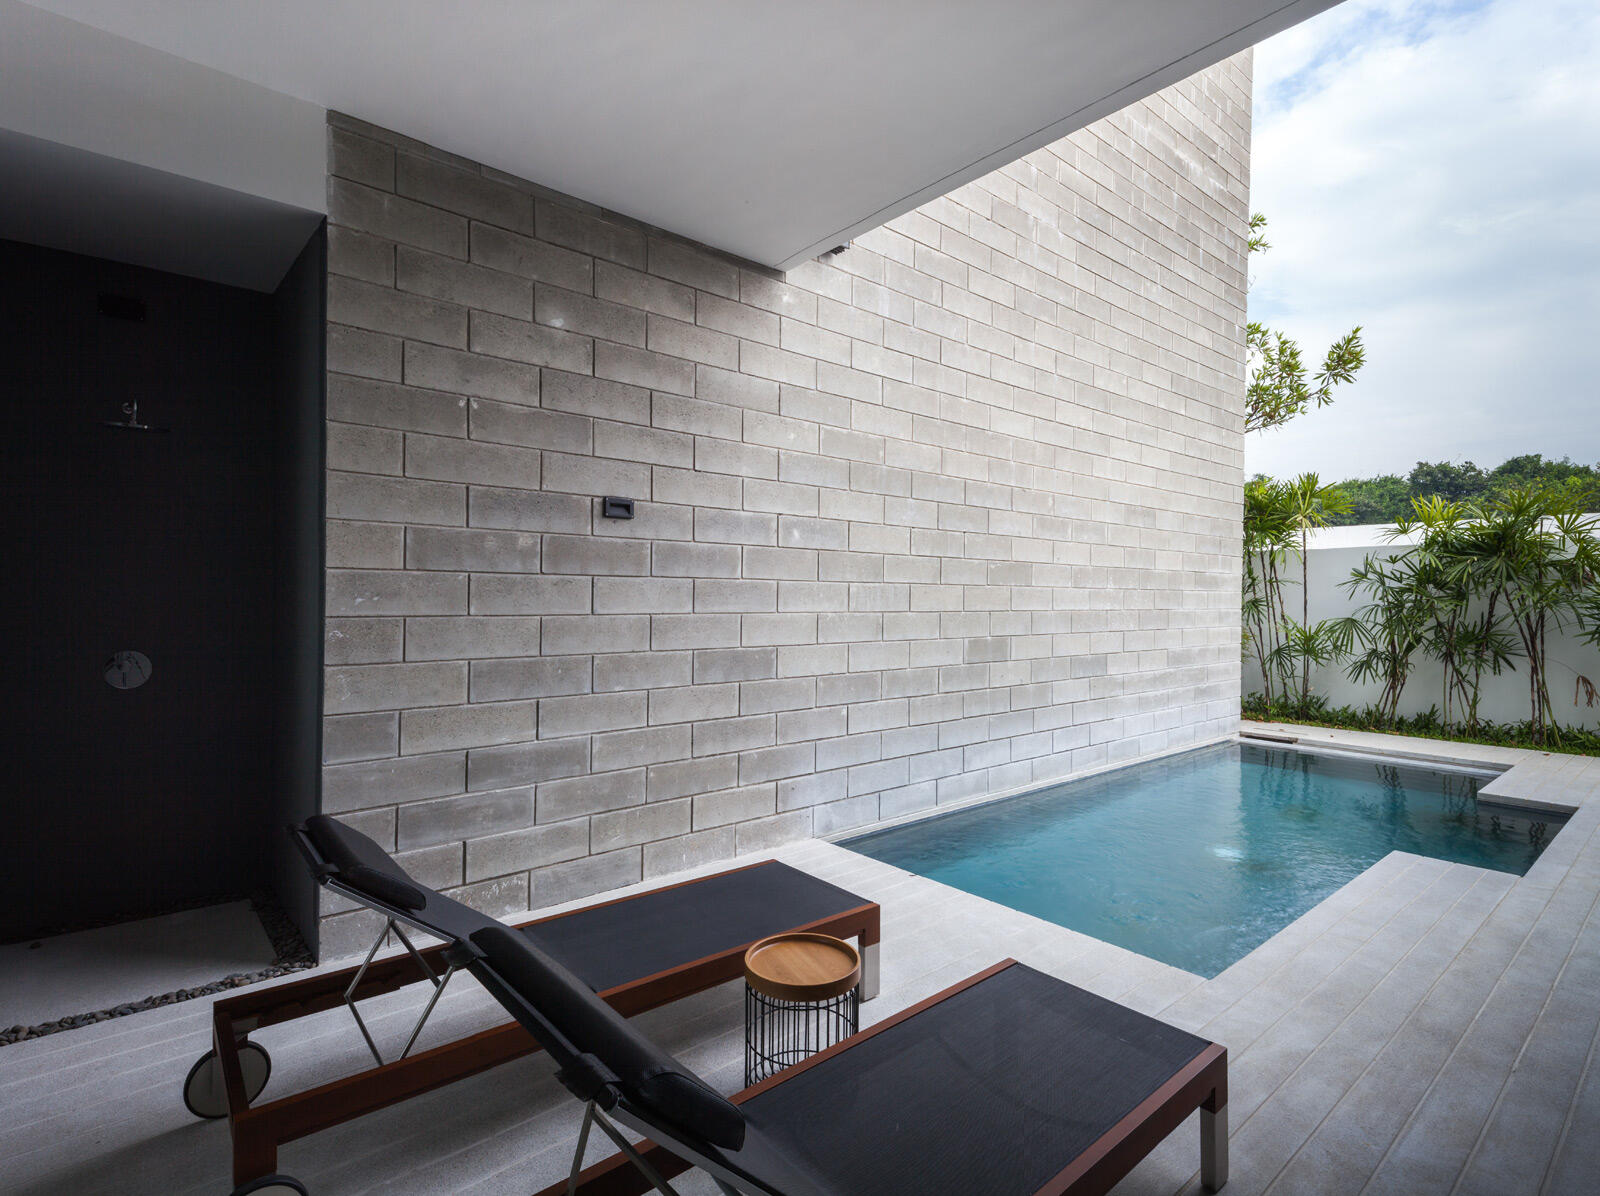 X2 Pattaya Oceanphere 2 Bedroom Villa - Relaxing Pool